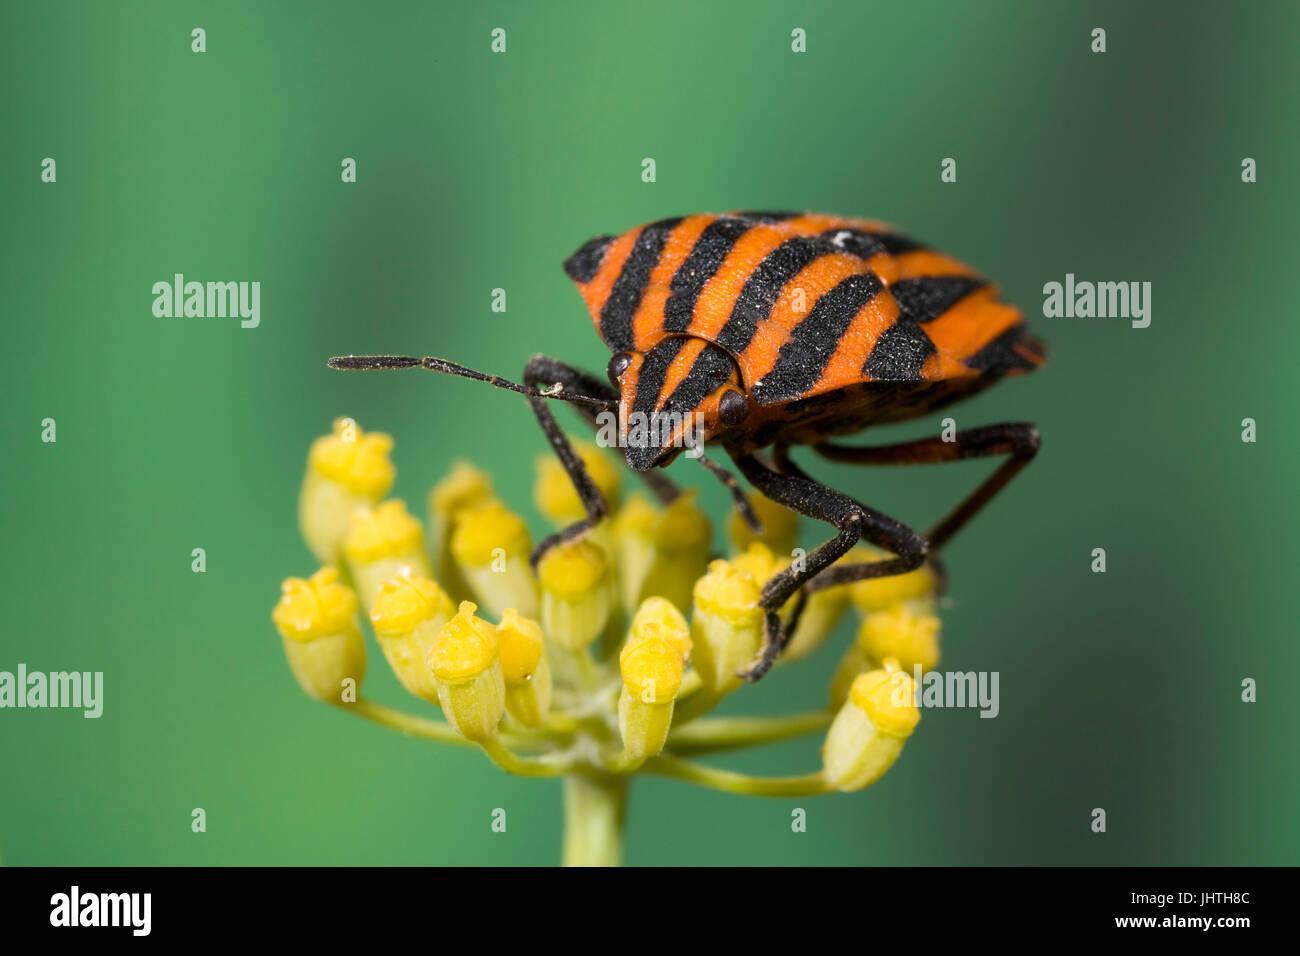 Rot und schwarz gestreift Stink Bug - Graphosoma lineatum Stockbild